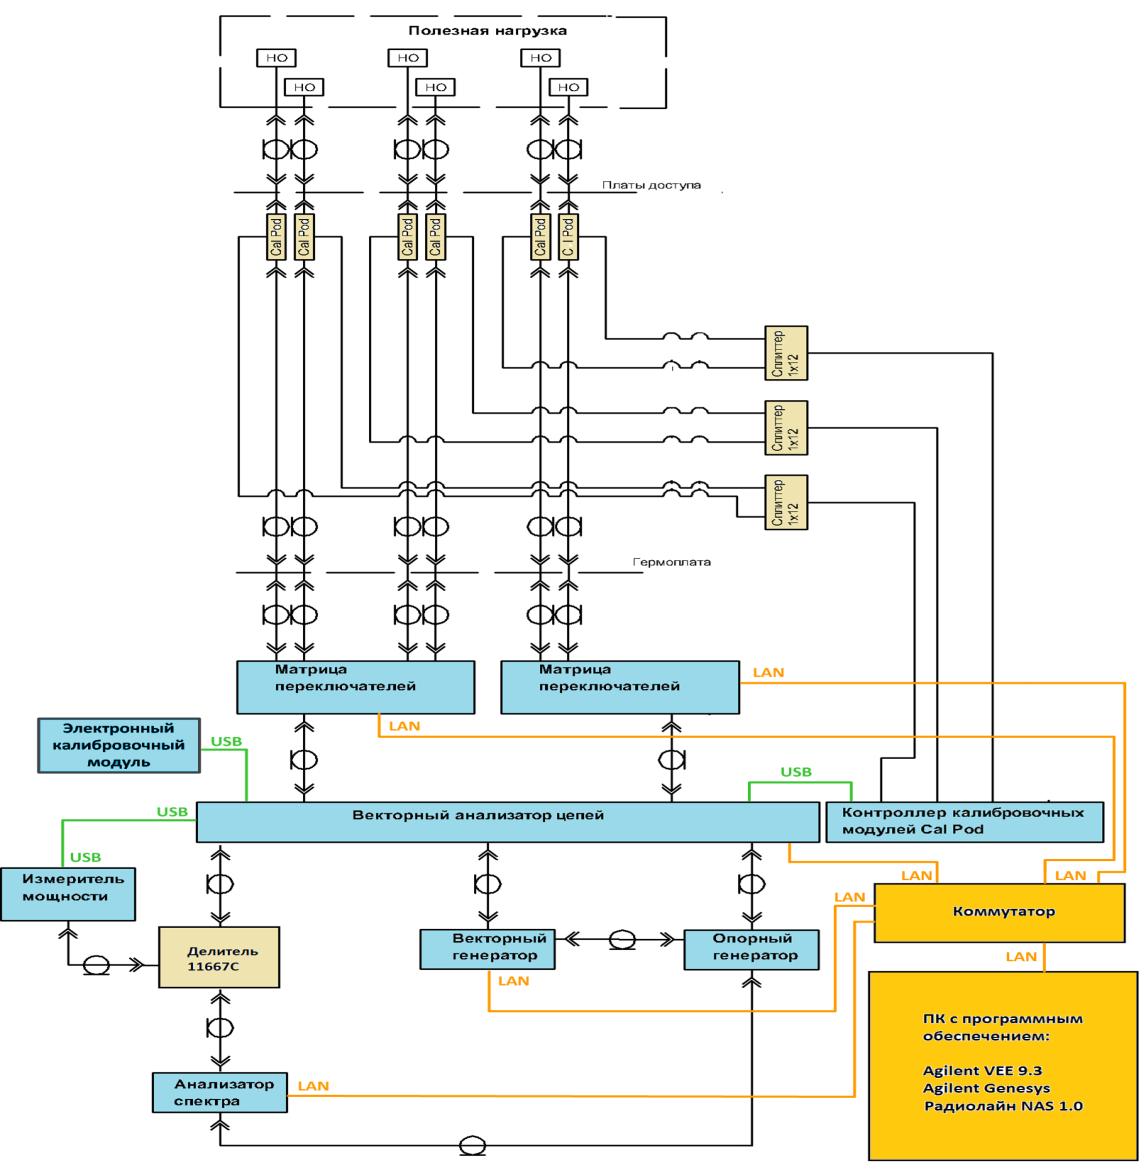 Структурная схема PTS-100, компания Радиолайн